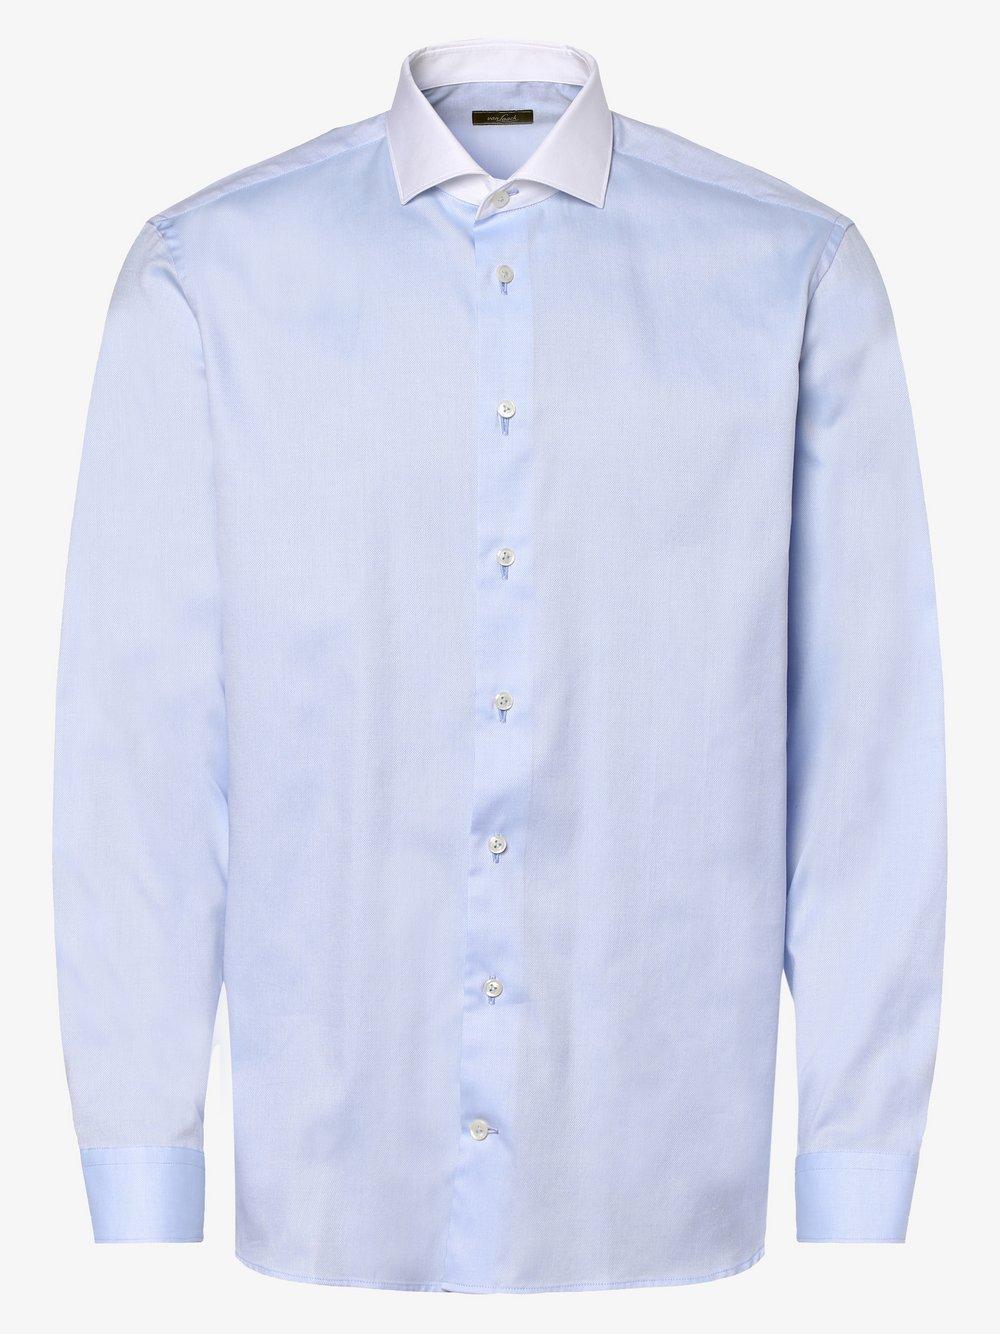 Van Laack – Koszula męska, niebieski Van Graaf 464602-0001-00400